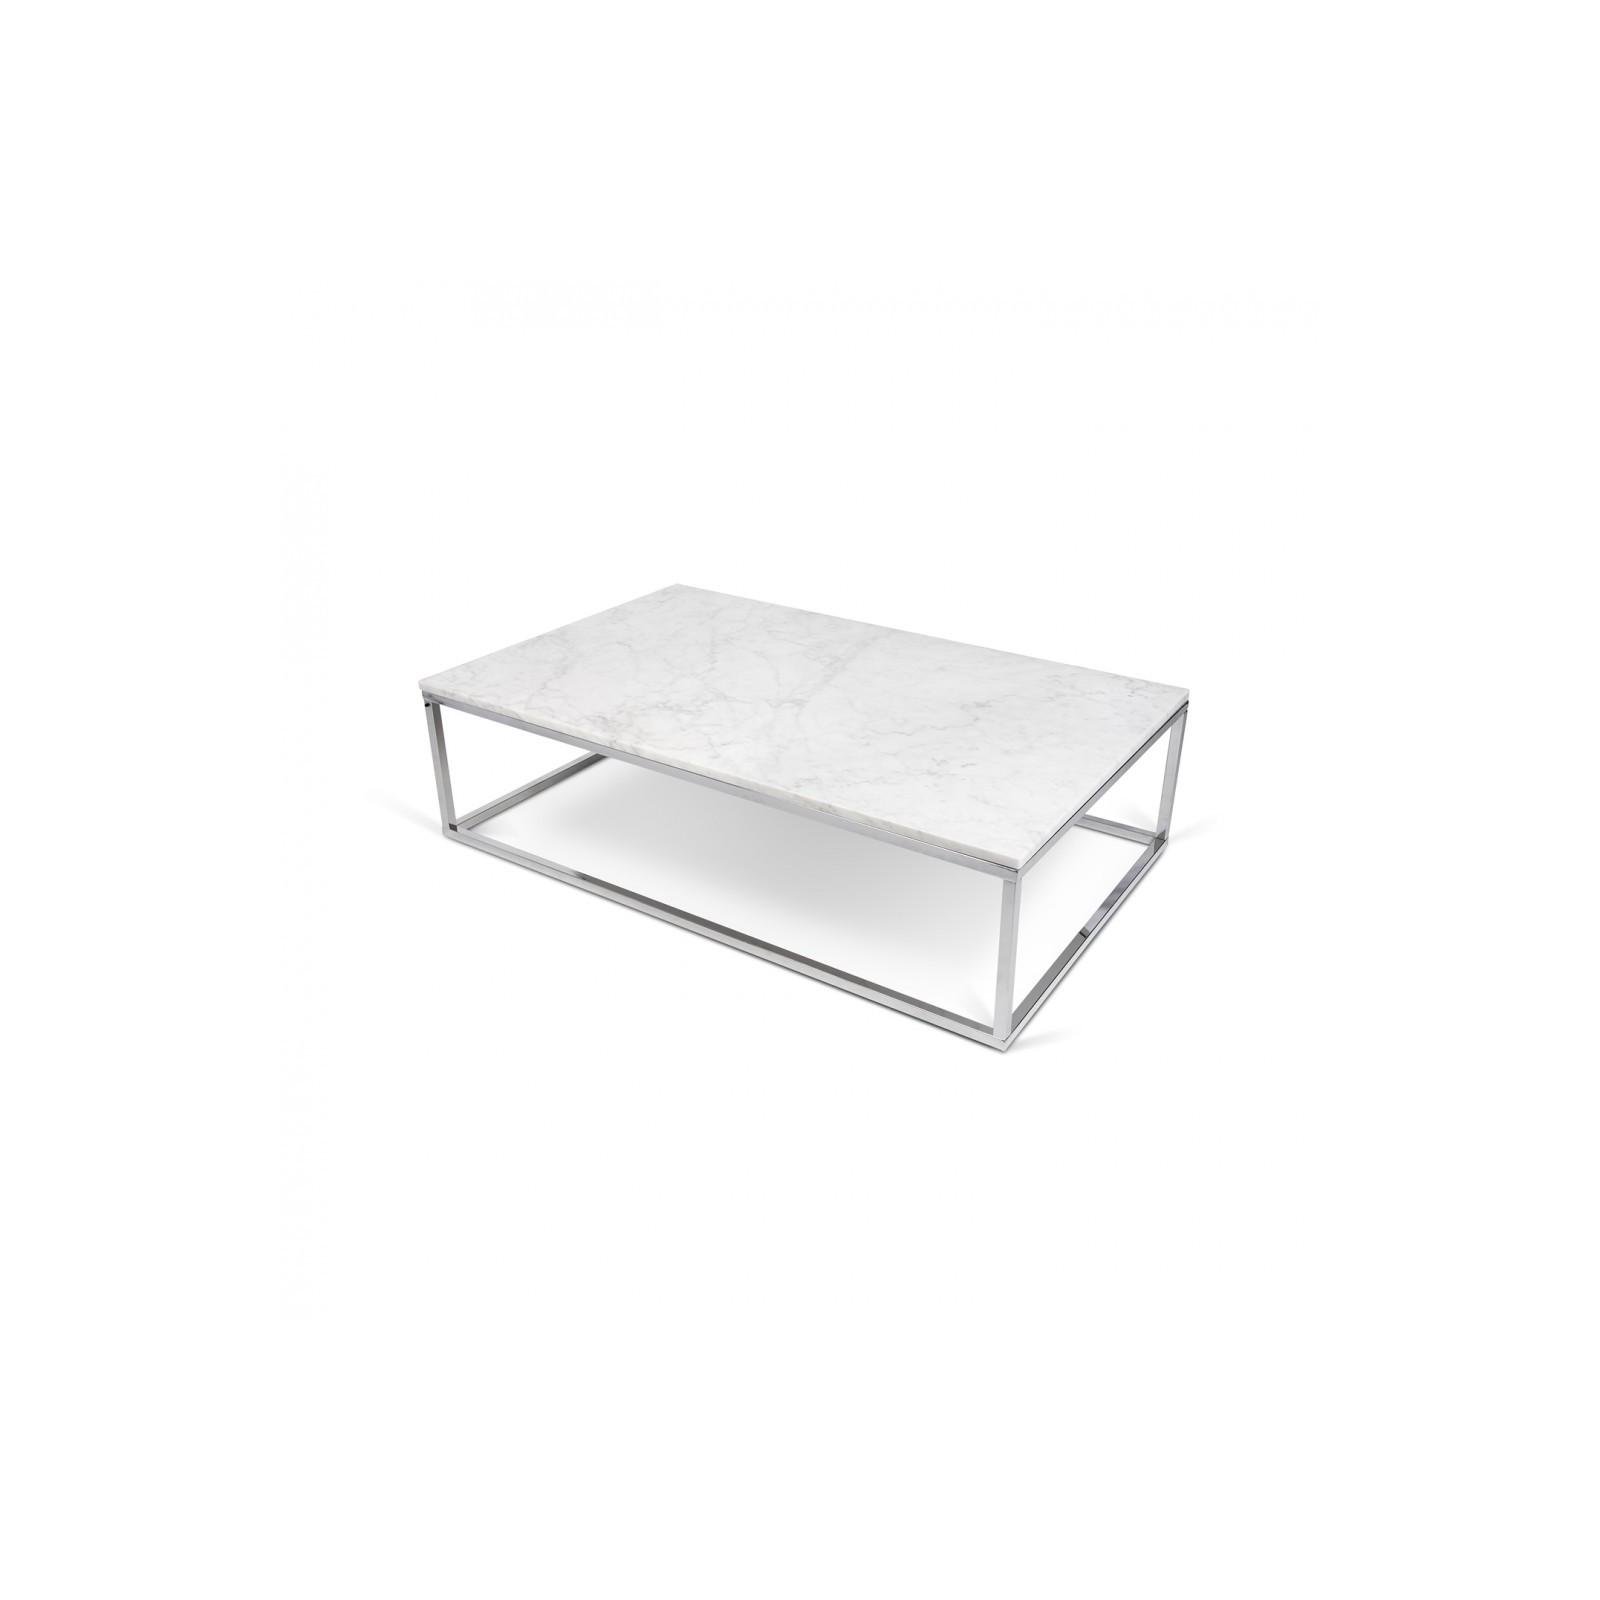 Merveilleux ... La Véritable Table Basse Marbre Blanc U0026 Noir ...